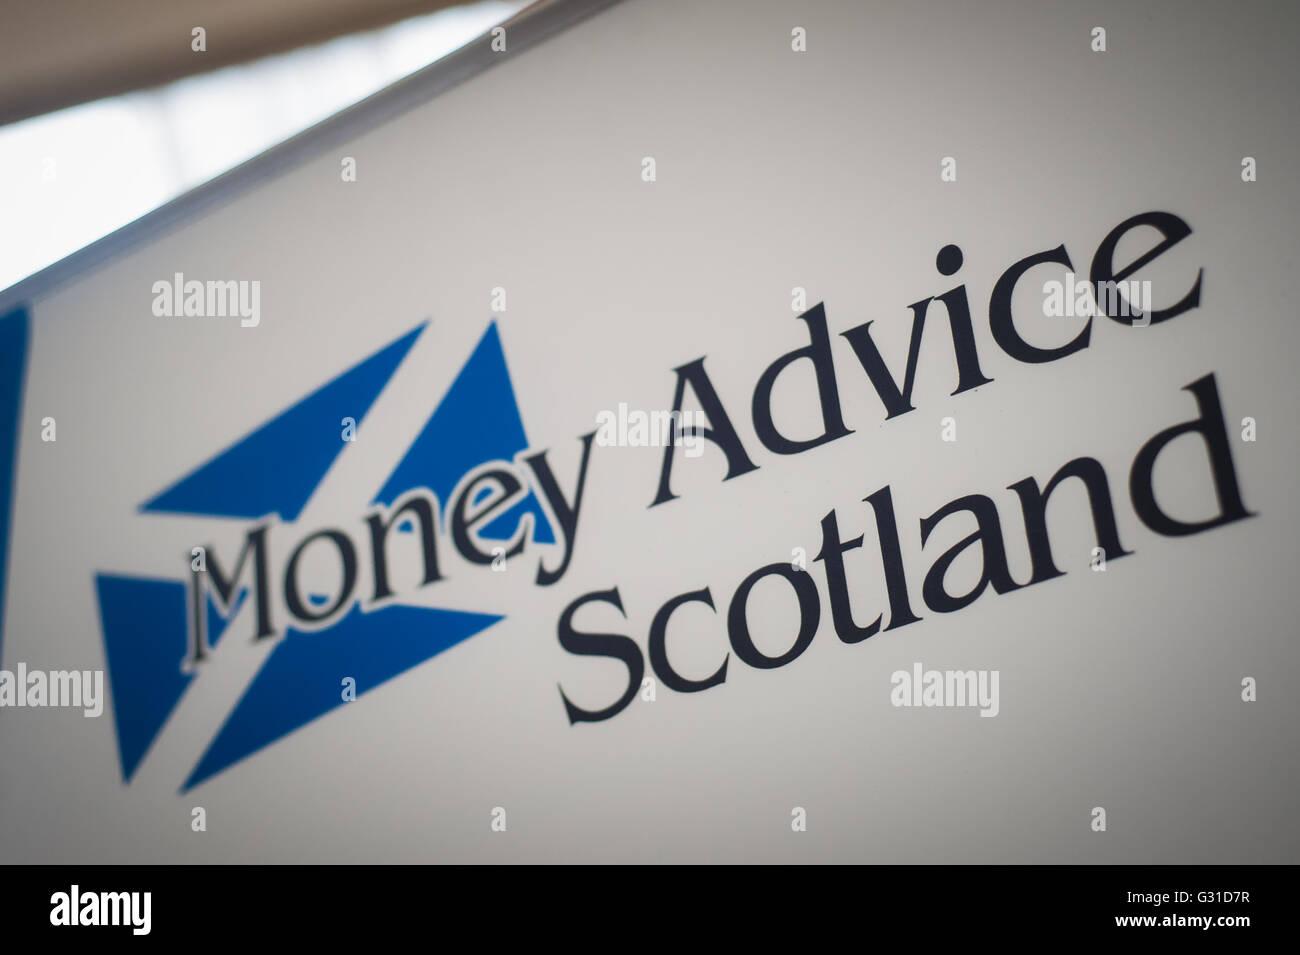 money advice Scotland logo on banner - Stock Image